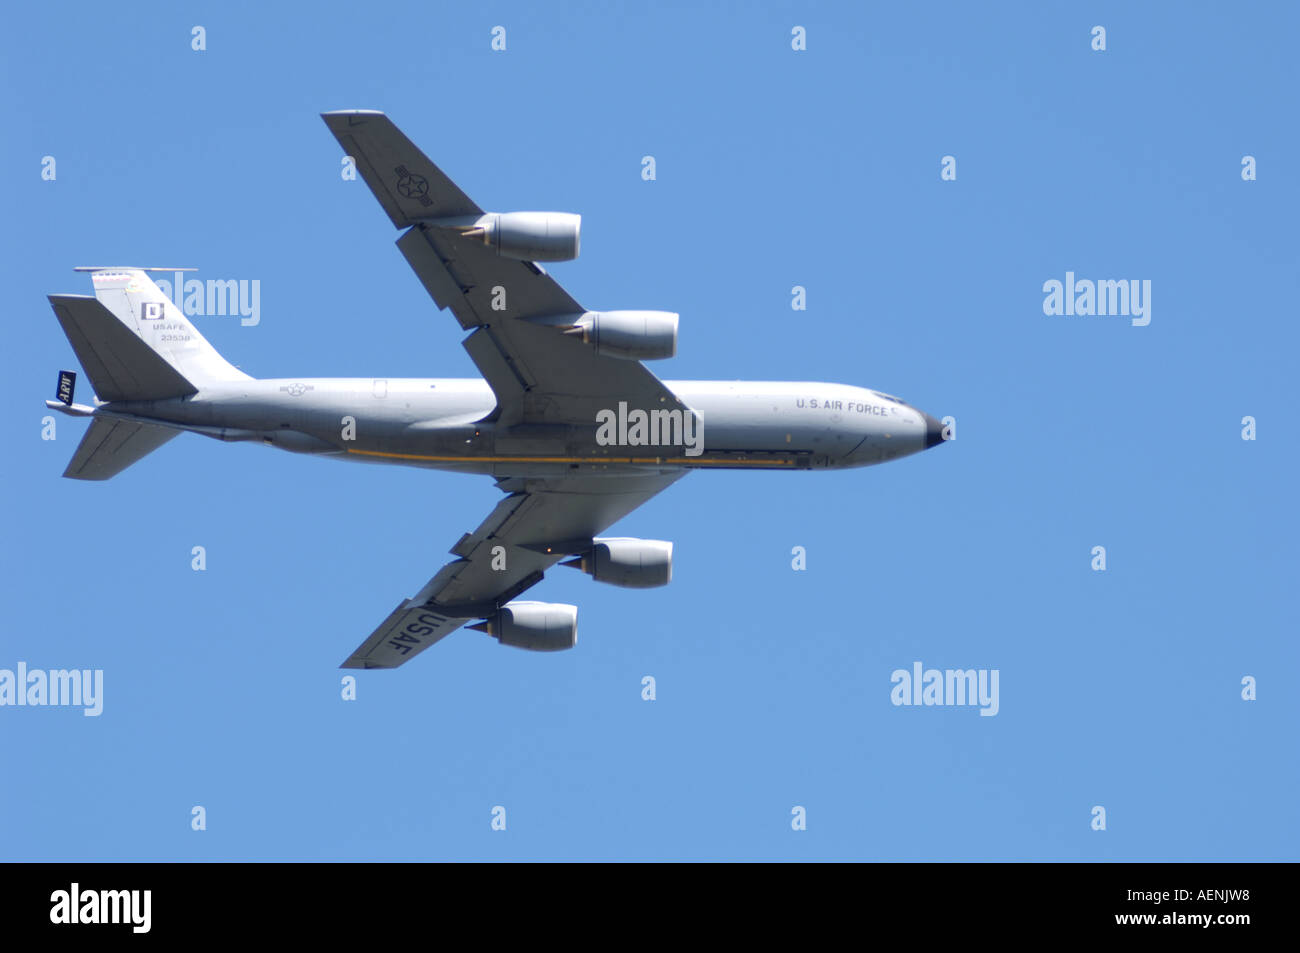 KC-135 Stratotanker of United States Air Force Registration No 23538 'D'.   XAV-528 Stock Photo